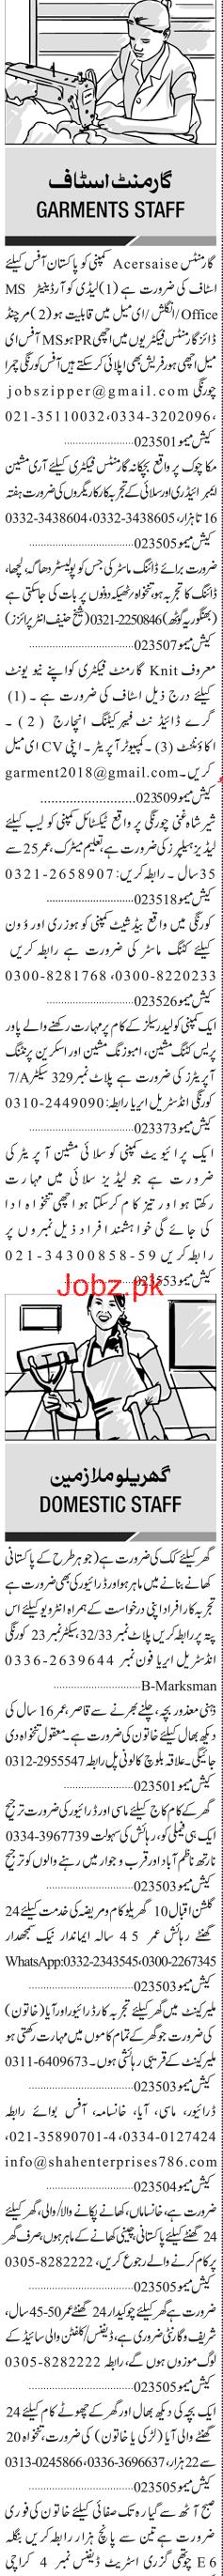 Lady Coordinators, Fabricating Incharge Job Opportunity